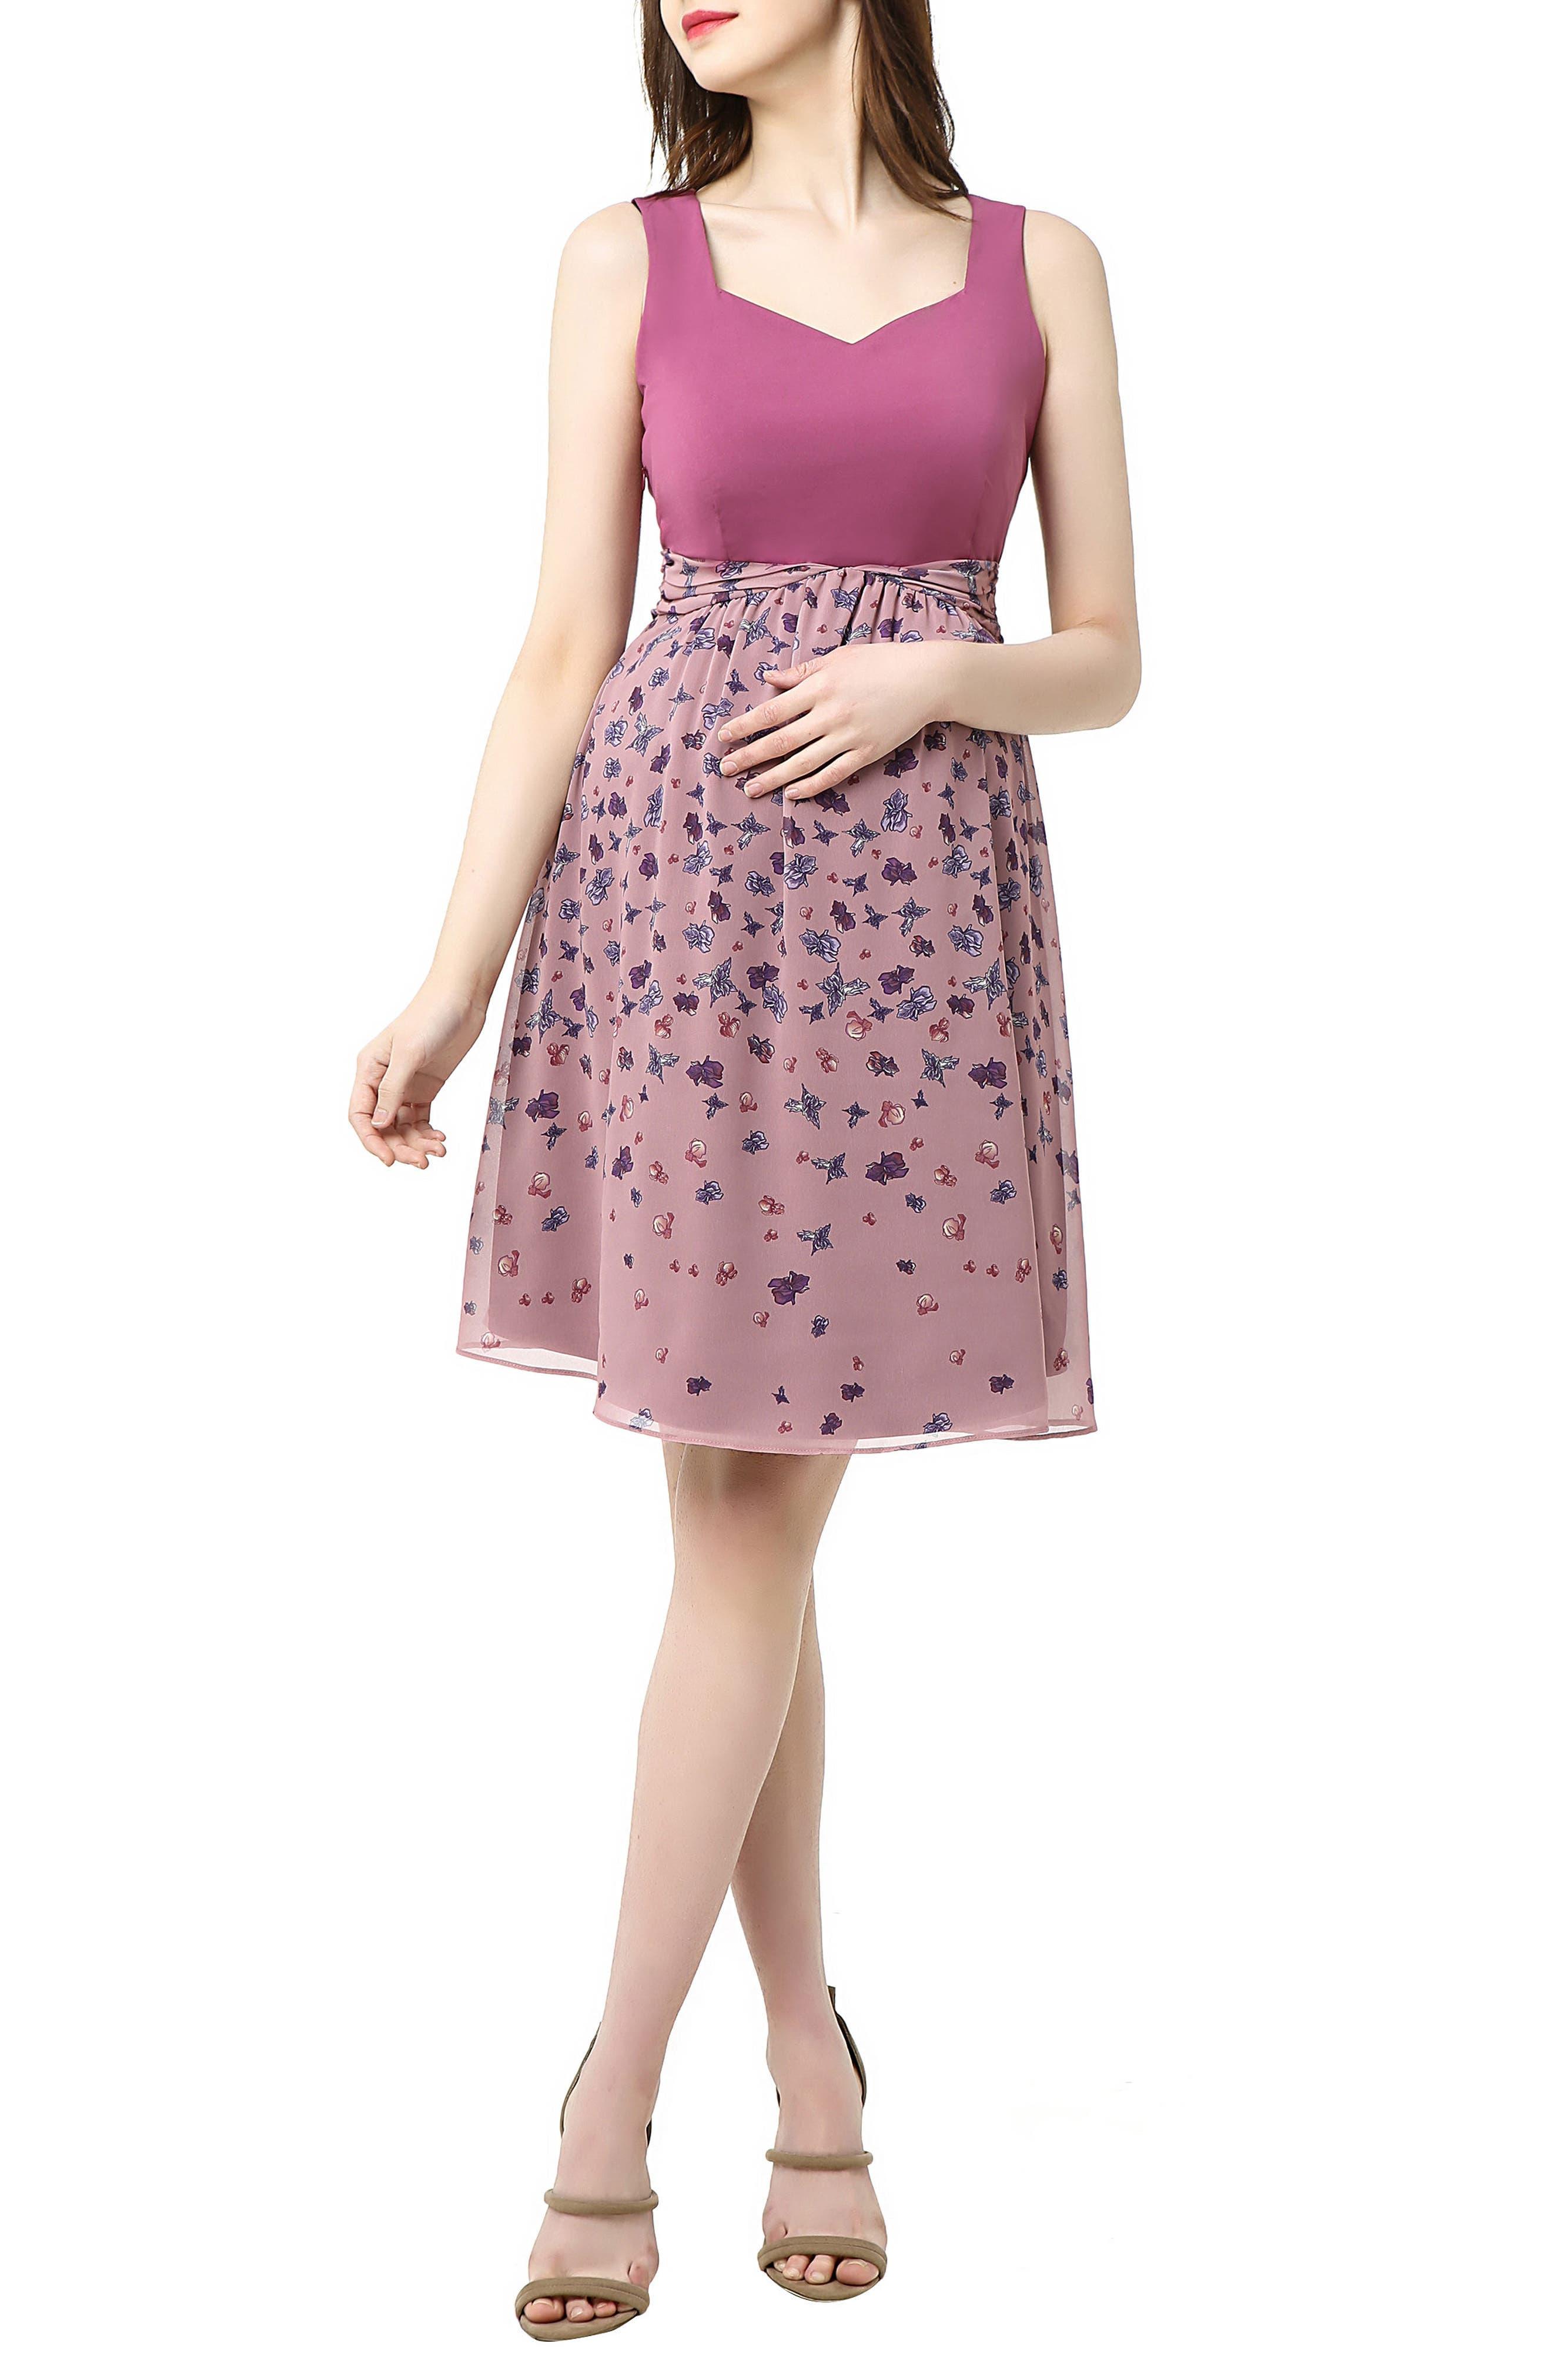 Libby Print Skirt Maternity Dress,                             Main thumbnail 1, color,                             Rose Pink